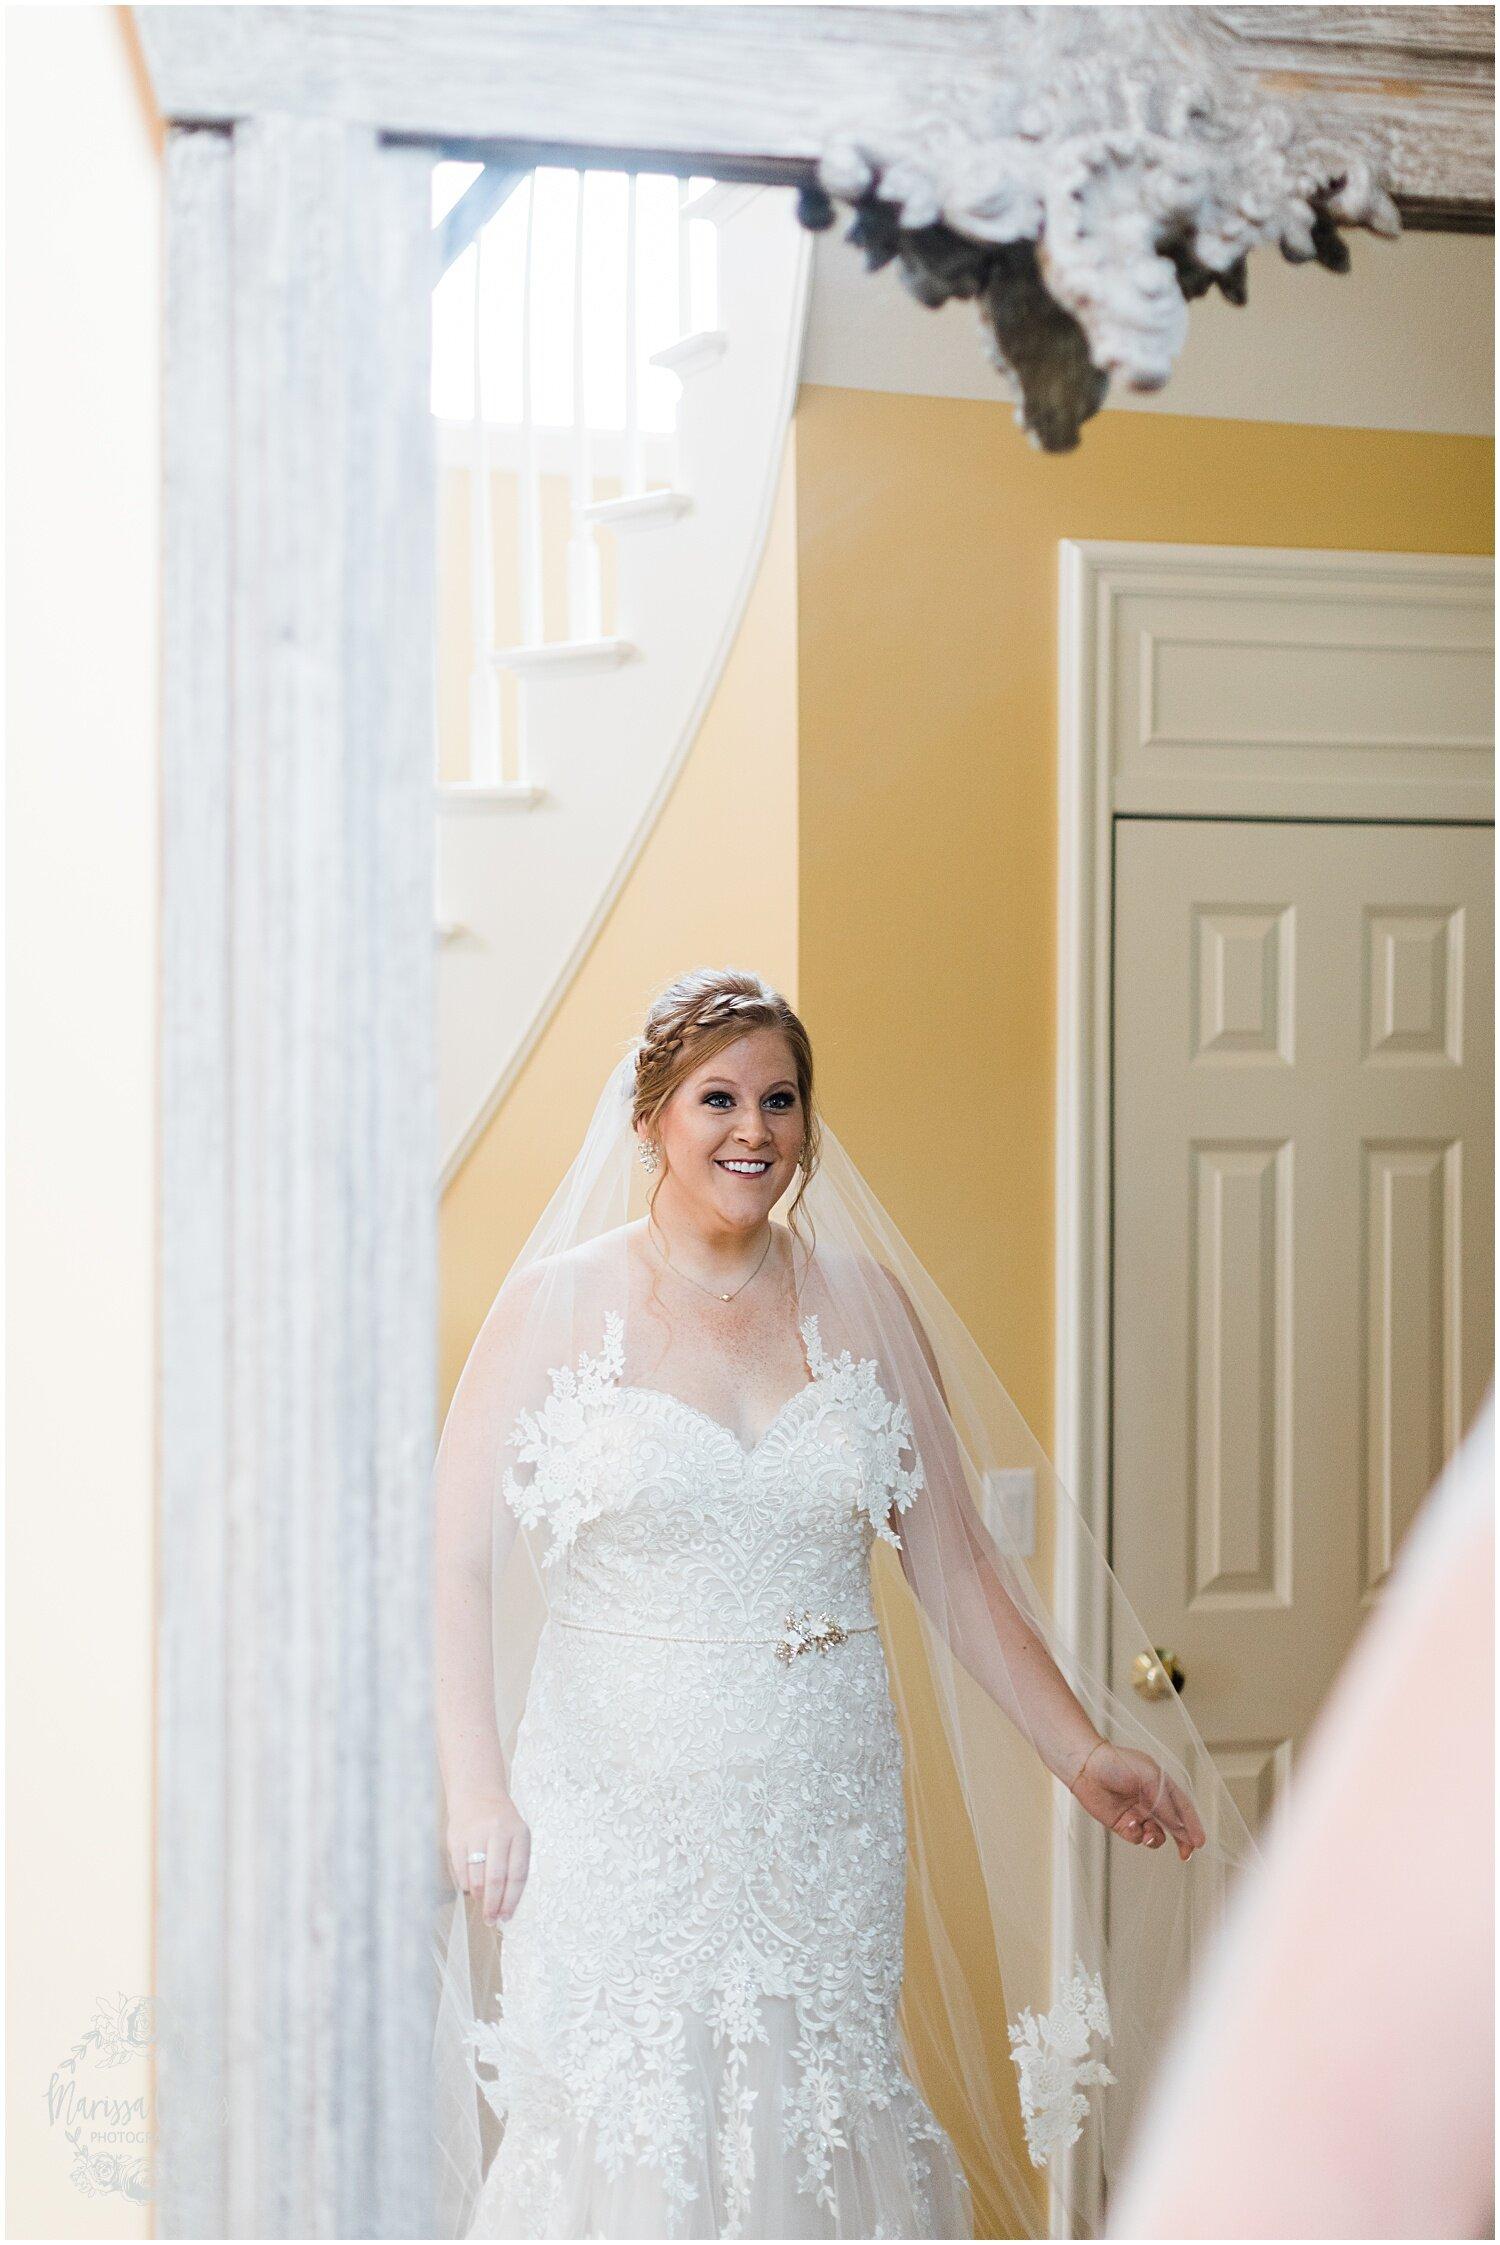 ANNA & LUKE MARRIED BLOG | MARISSA CRIBBS PHOTOGRAPHY | WESTON RED BARN FARM_9350.jpg